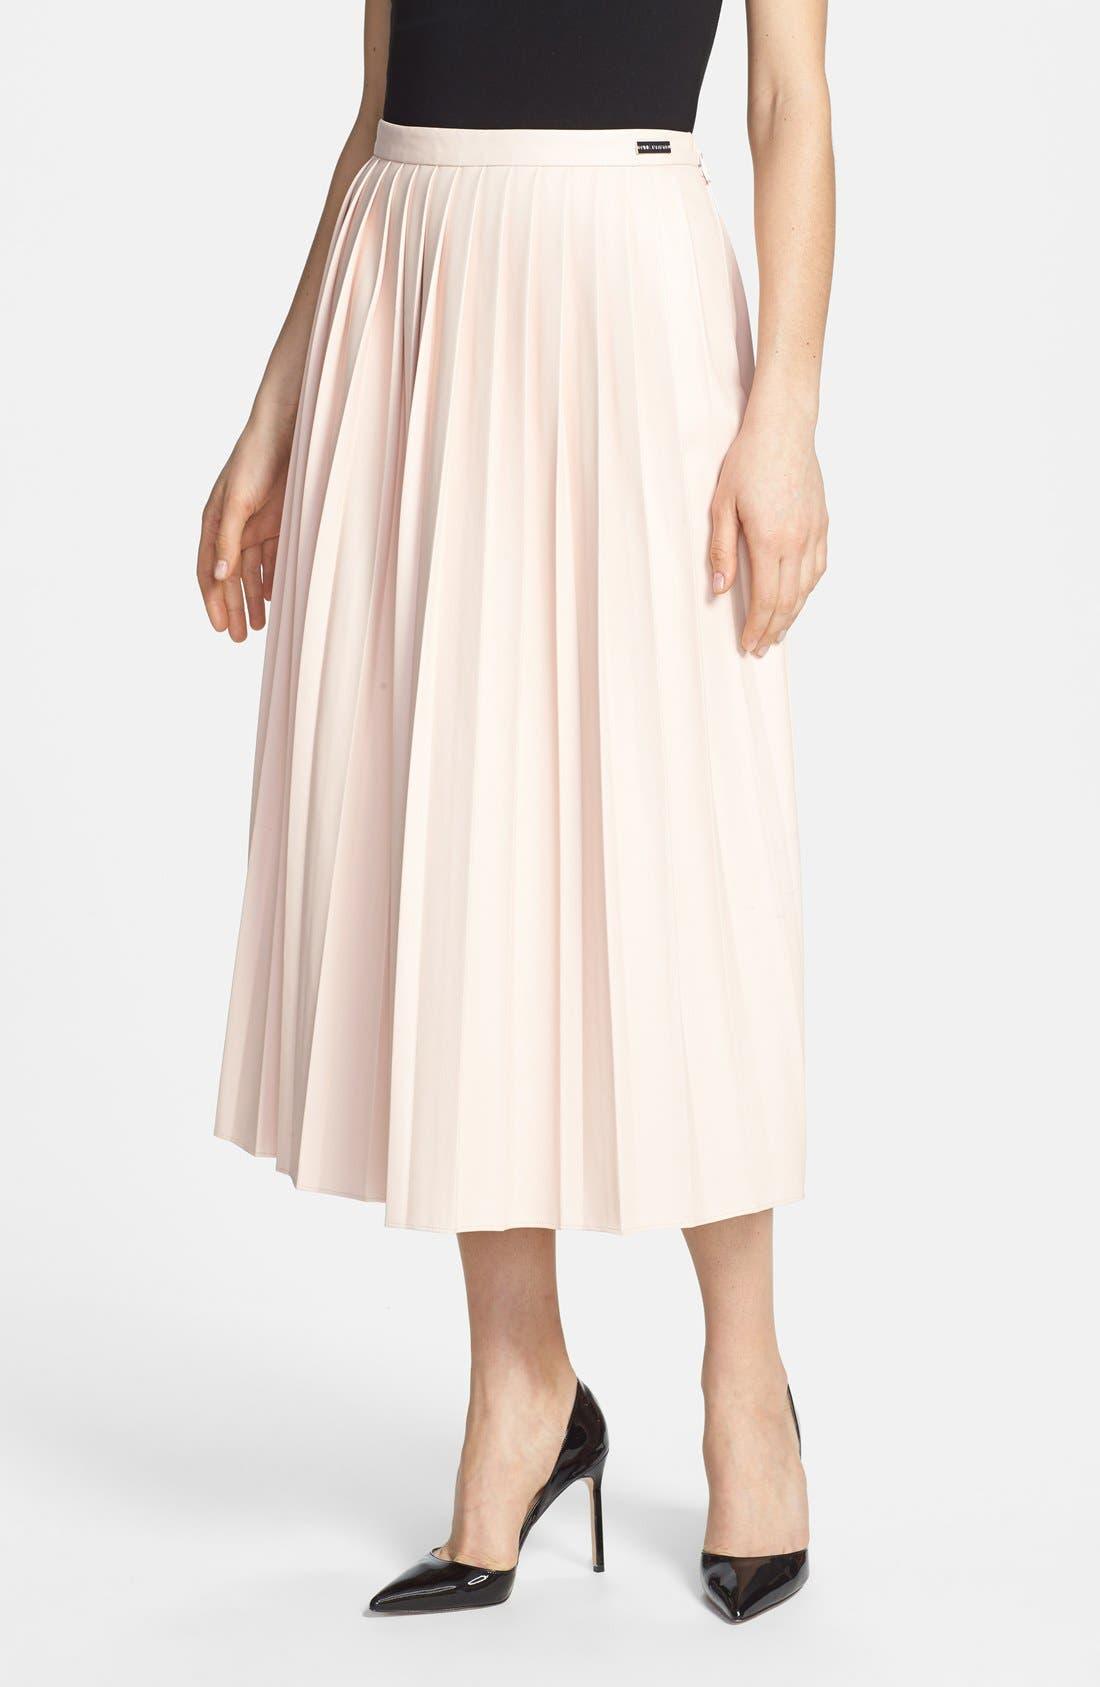 Alternate Image 1 Selected - Pink Tartan Faux Leather Pleat Skirt